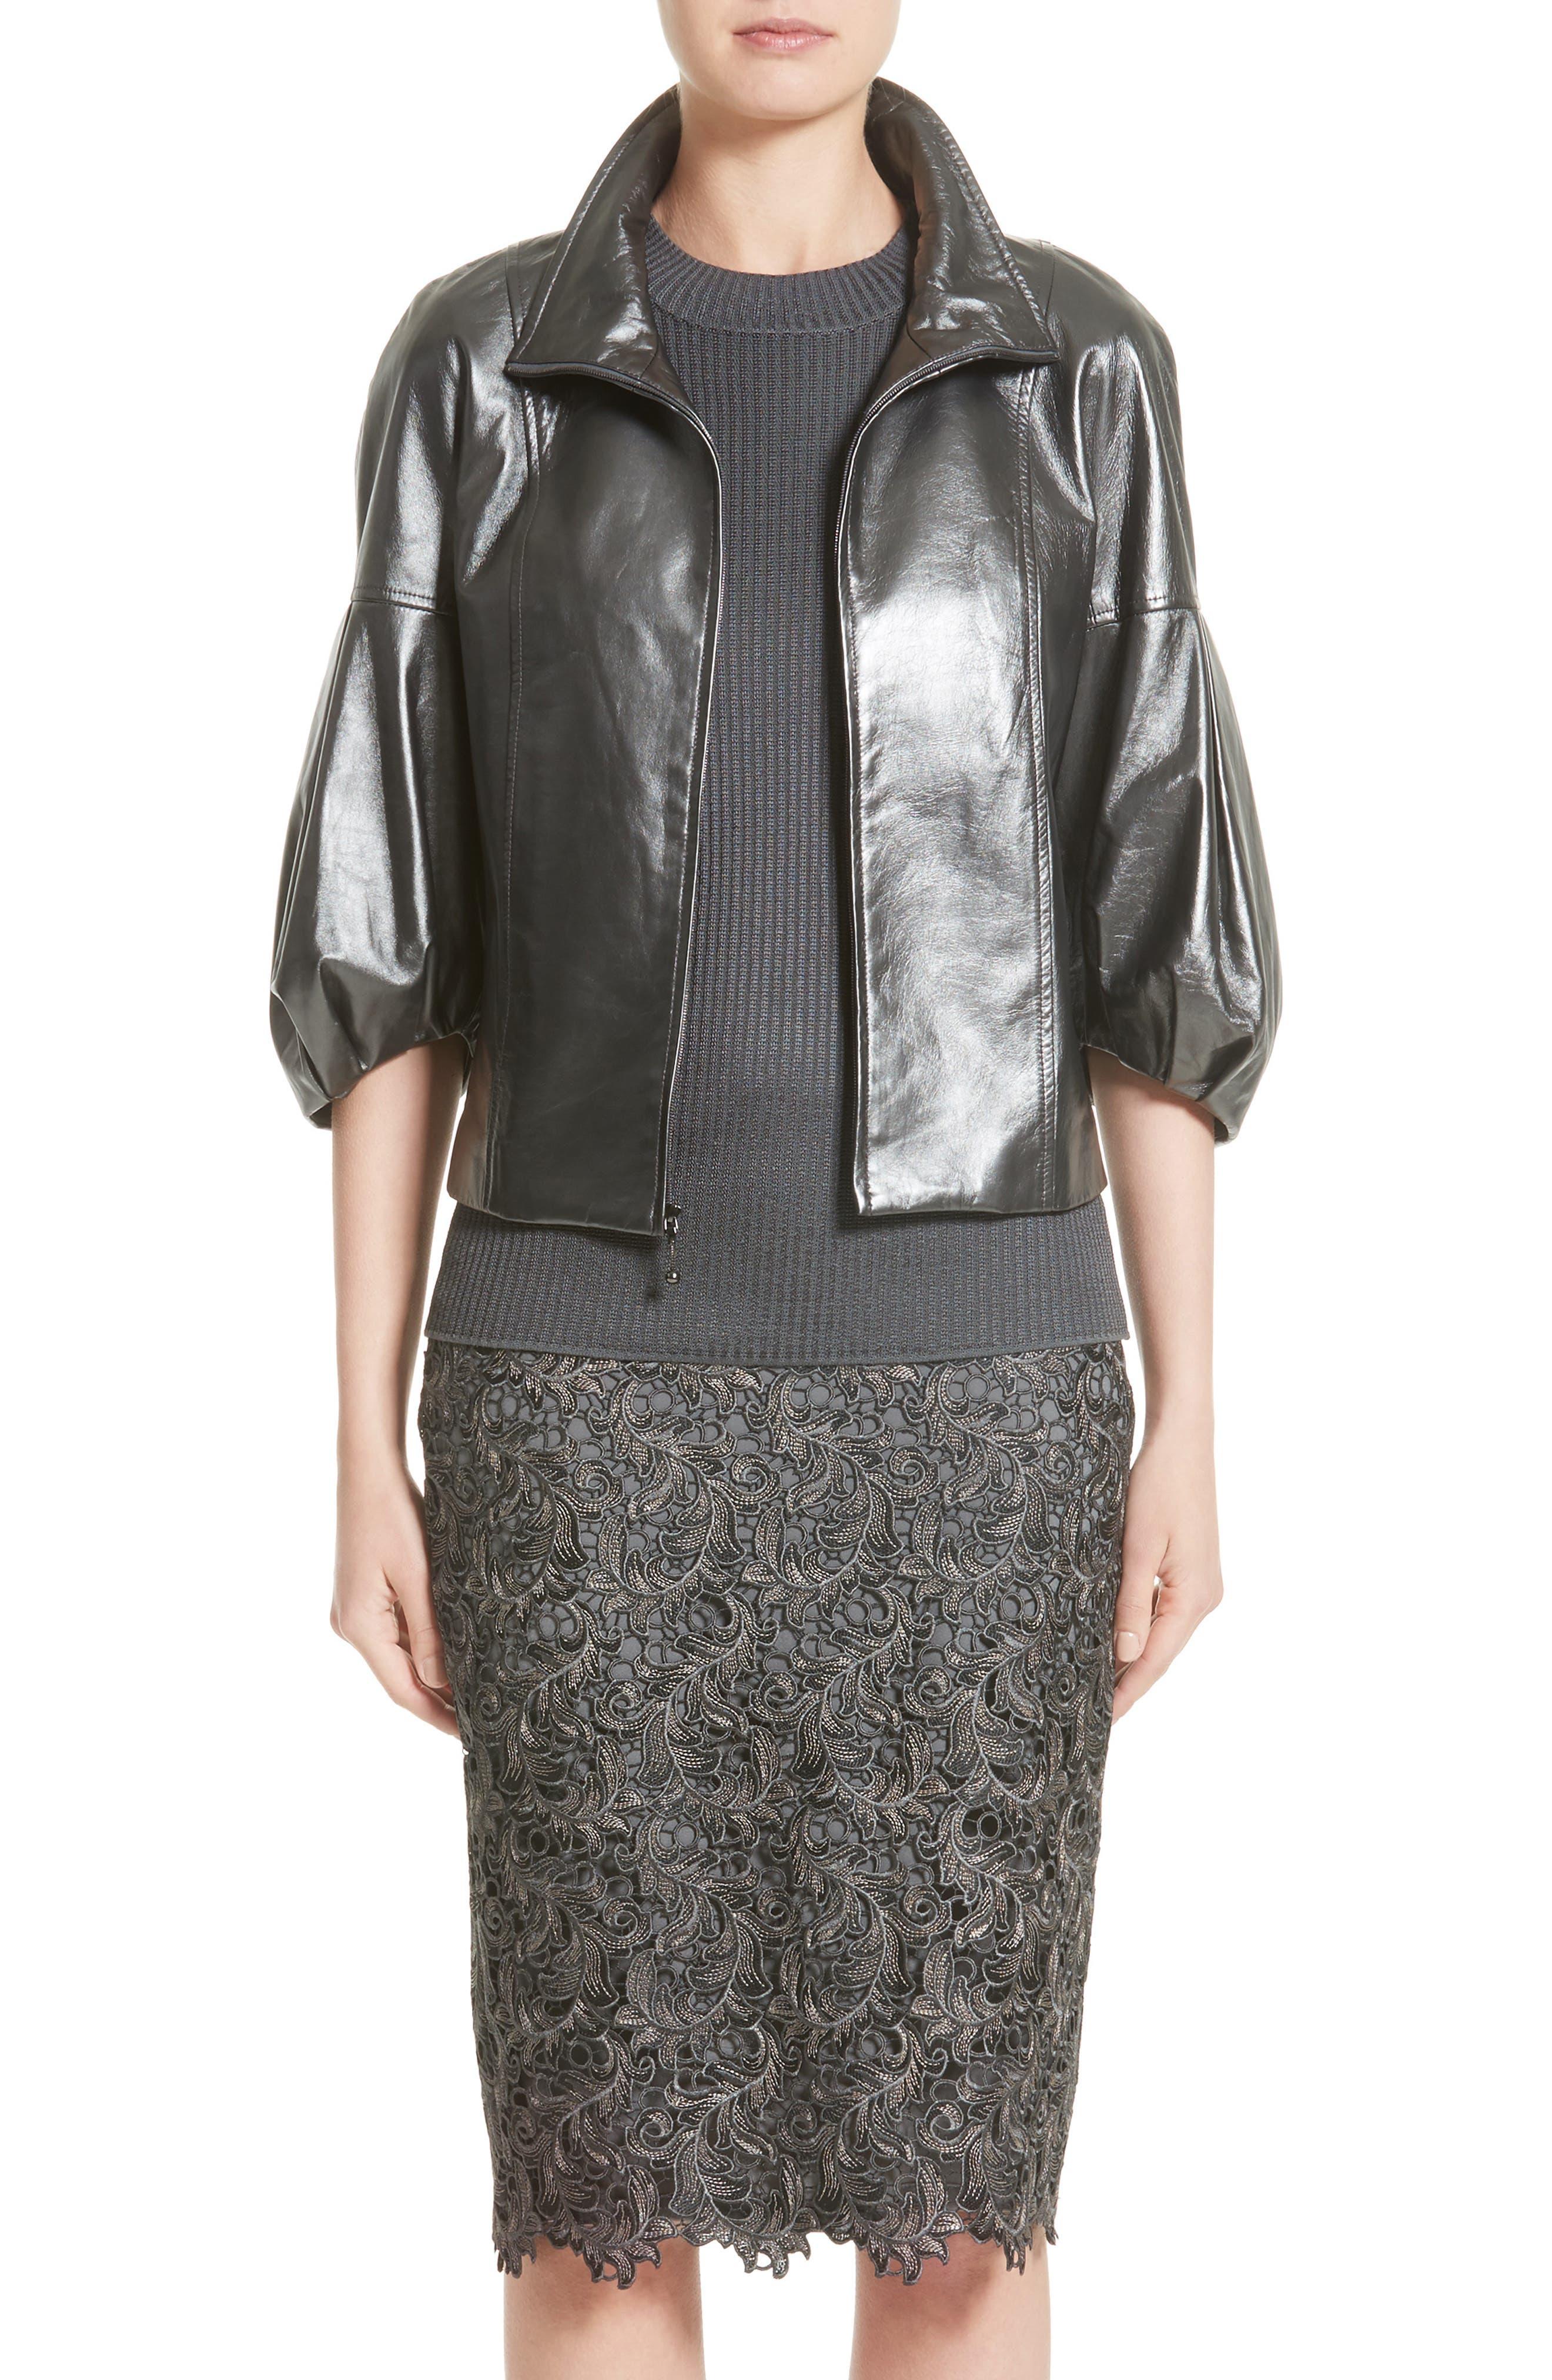 Pearlized Nappa Leather Jacket,                             Main thumbnail 1, color,                             020